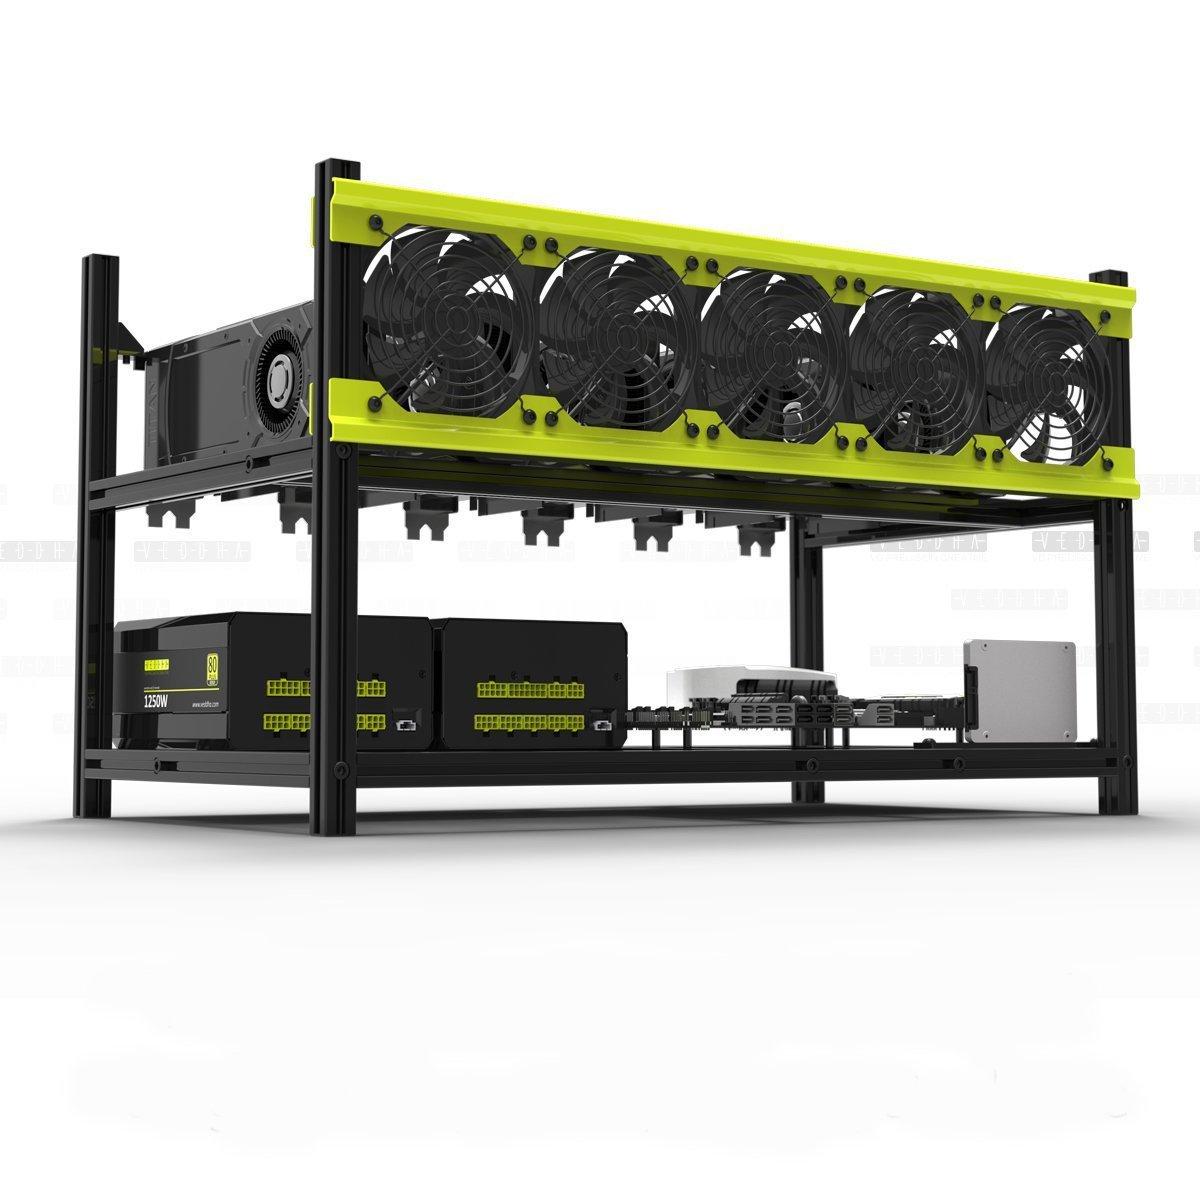 Veddha Professional 6 GPU Miner Case Aluminum Stackable Mining Case Rig  Open Air Frame for Ethereum(ETH)/ETC/ZCash/Monero/BTC Excellent air  Convection